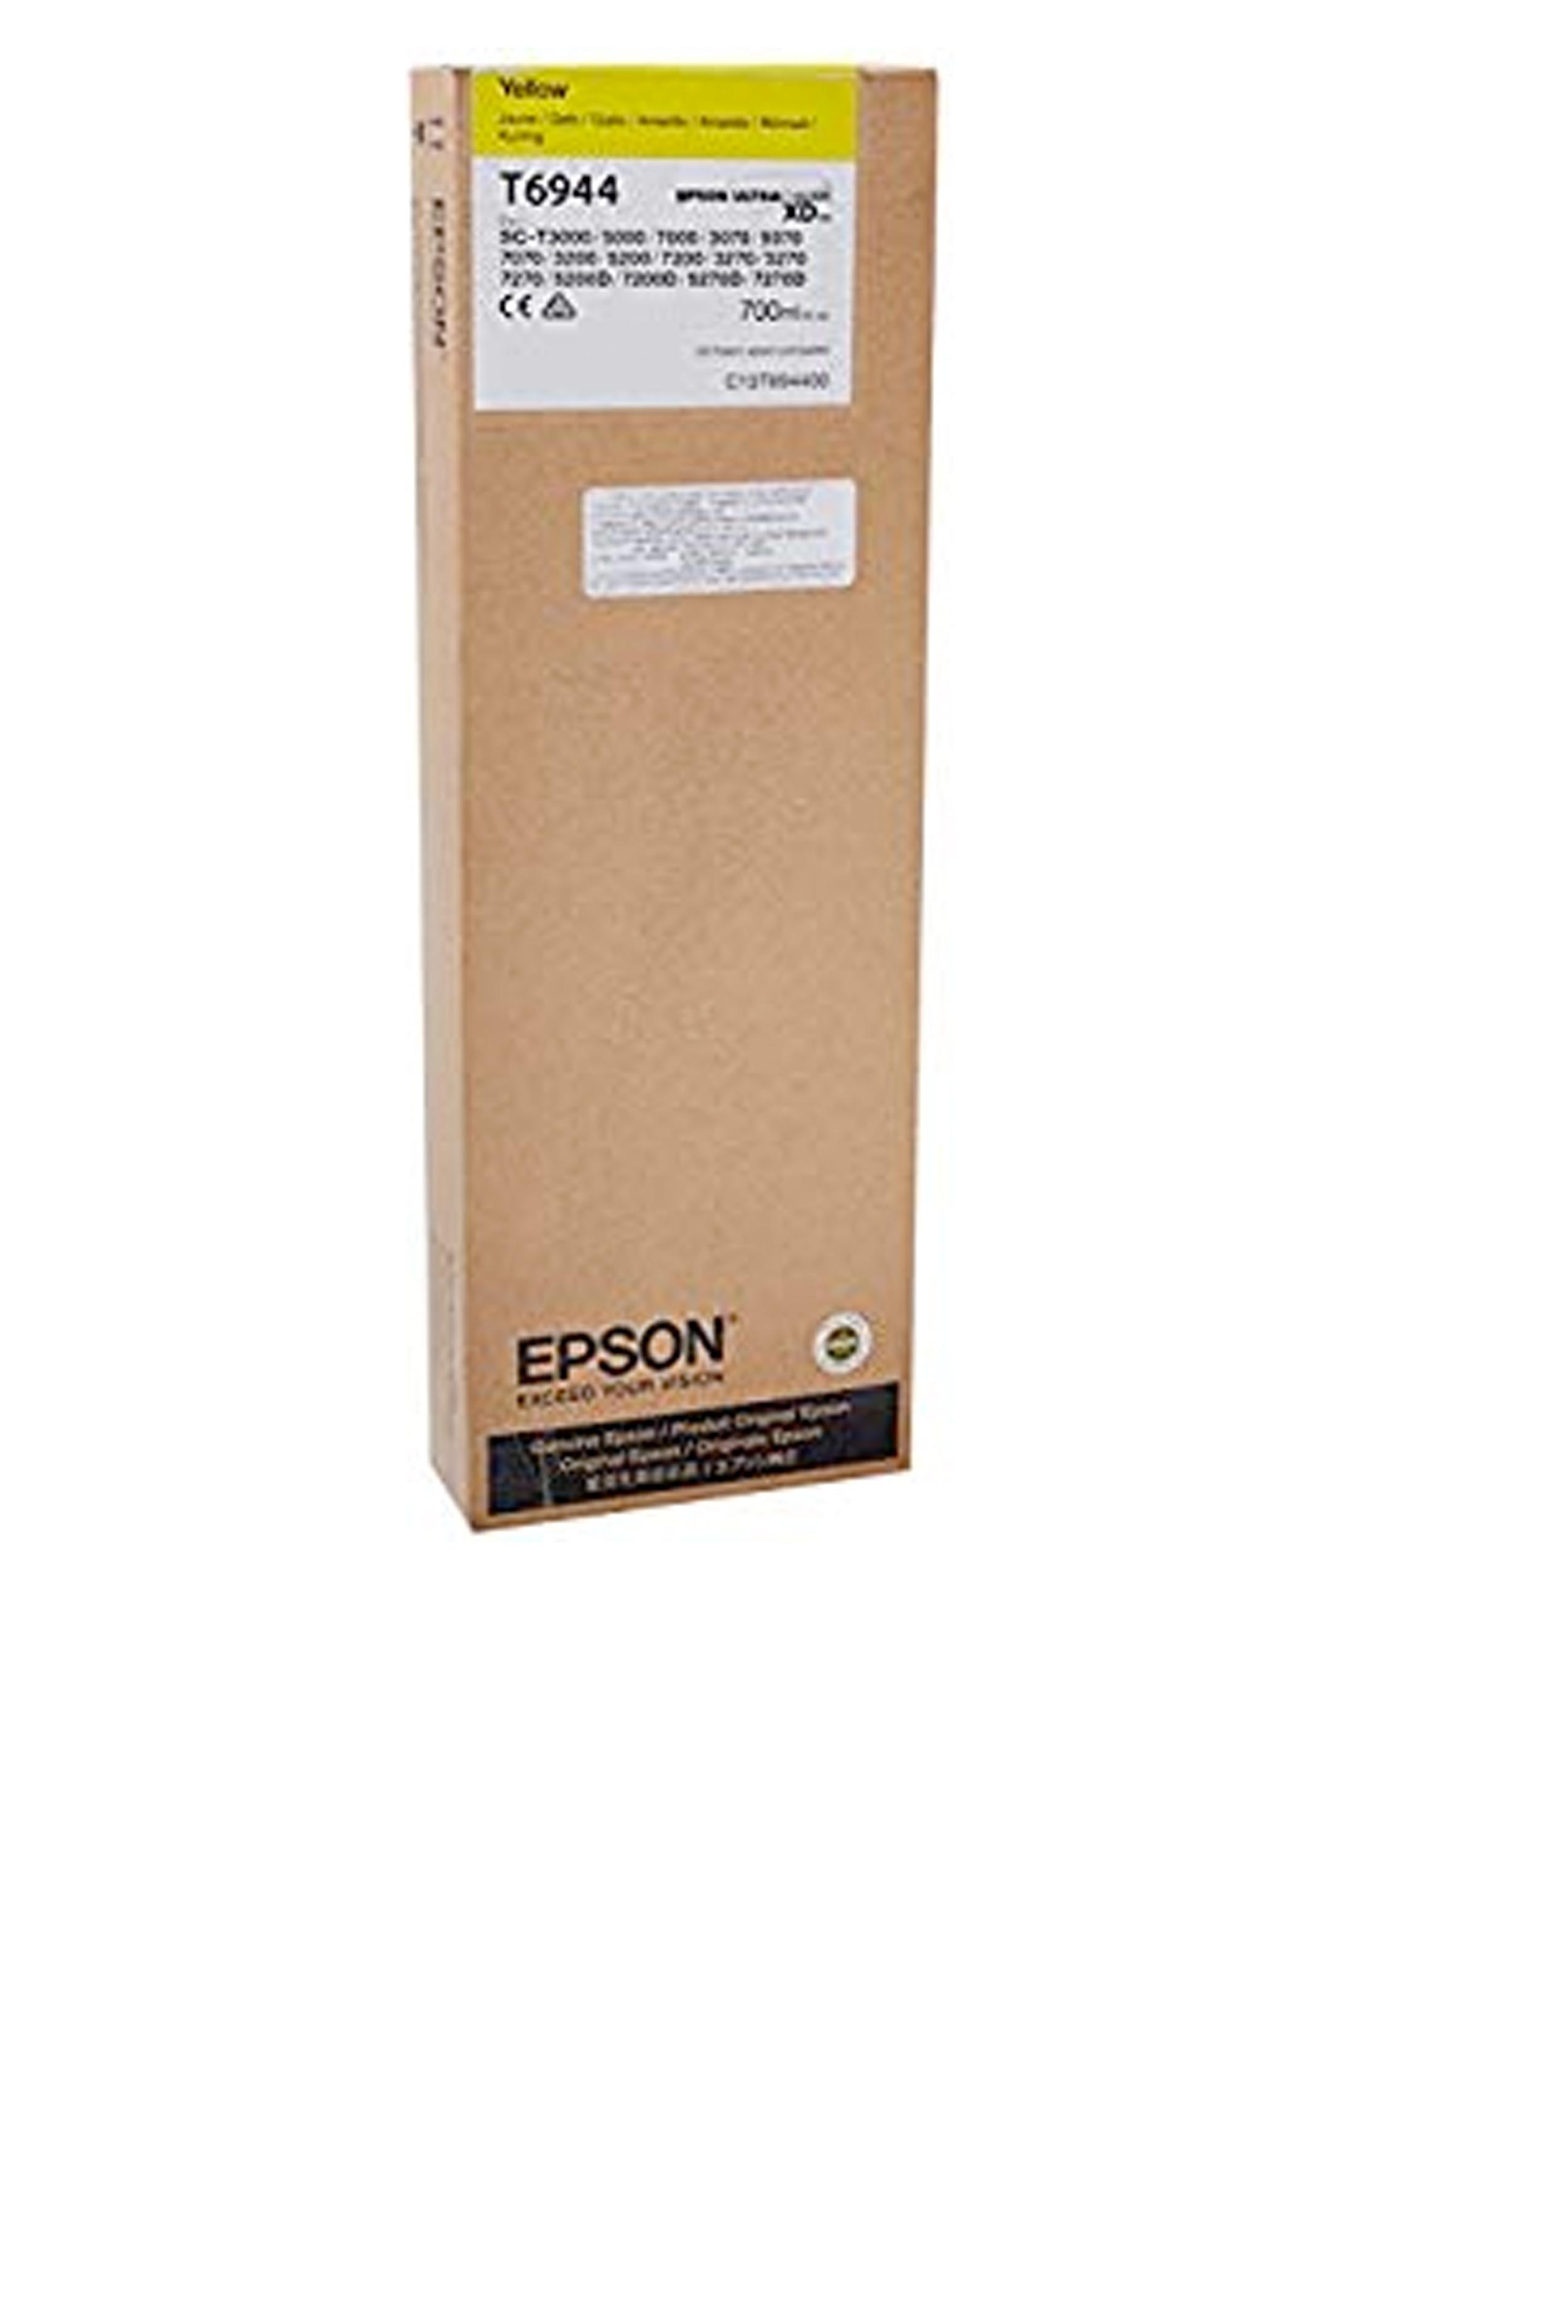 Epson EPSON HI YELLOW INK (700 ML) (T694400)